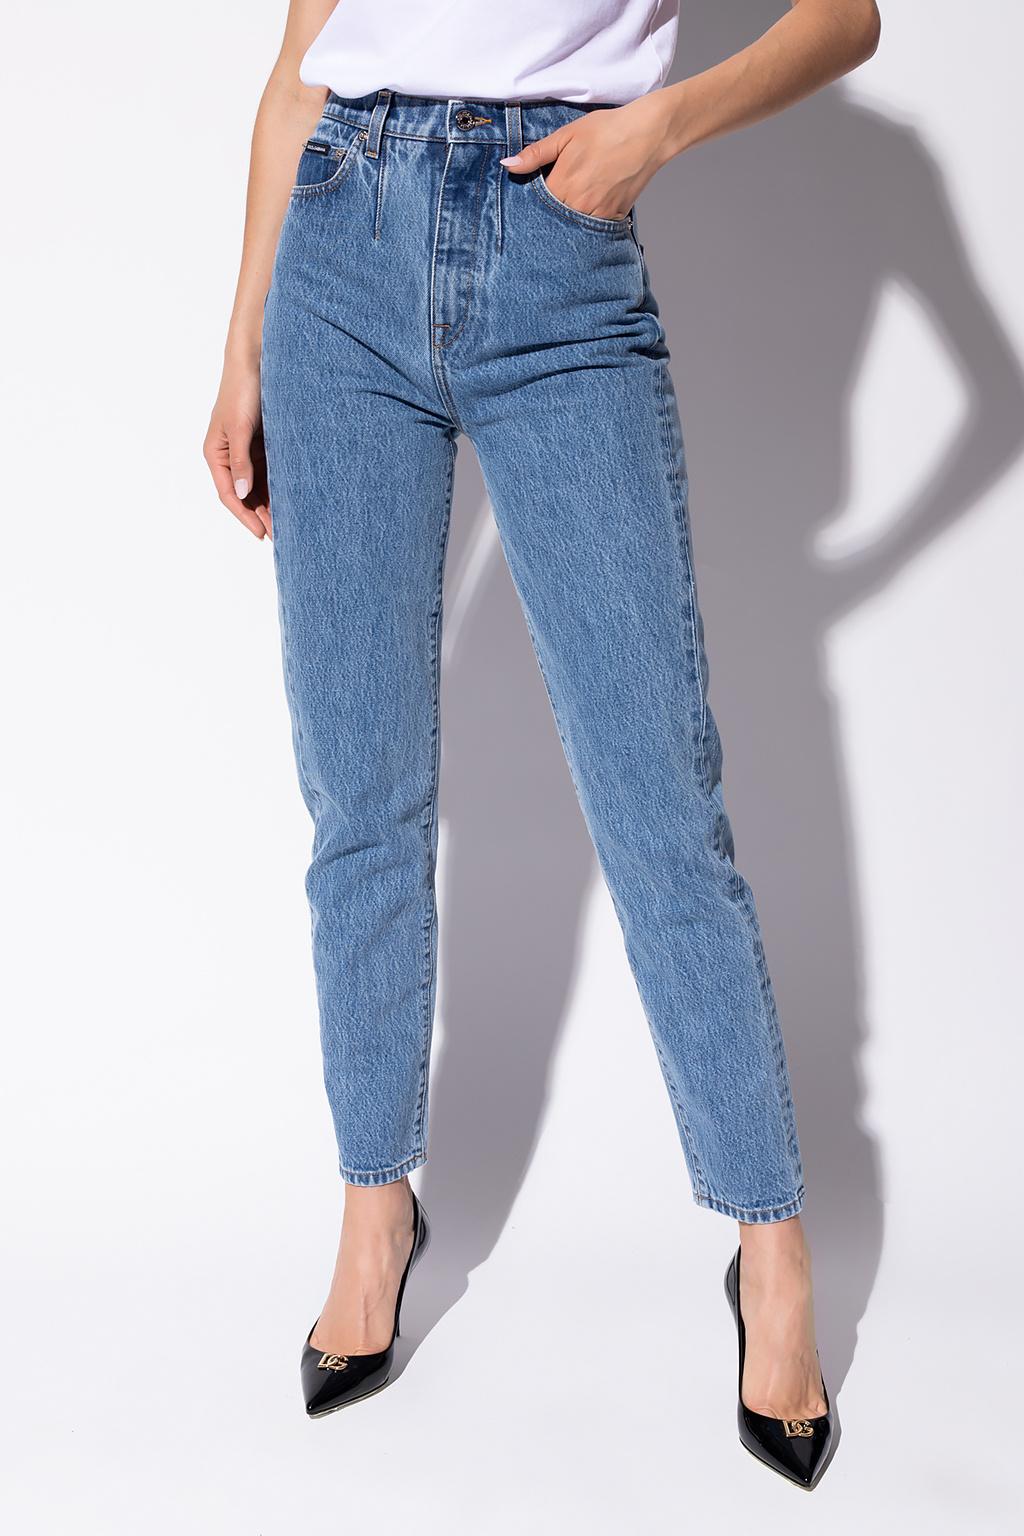 Dolce & Gabbana 高腰牛仔裤